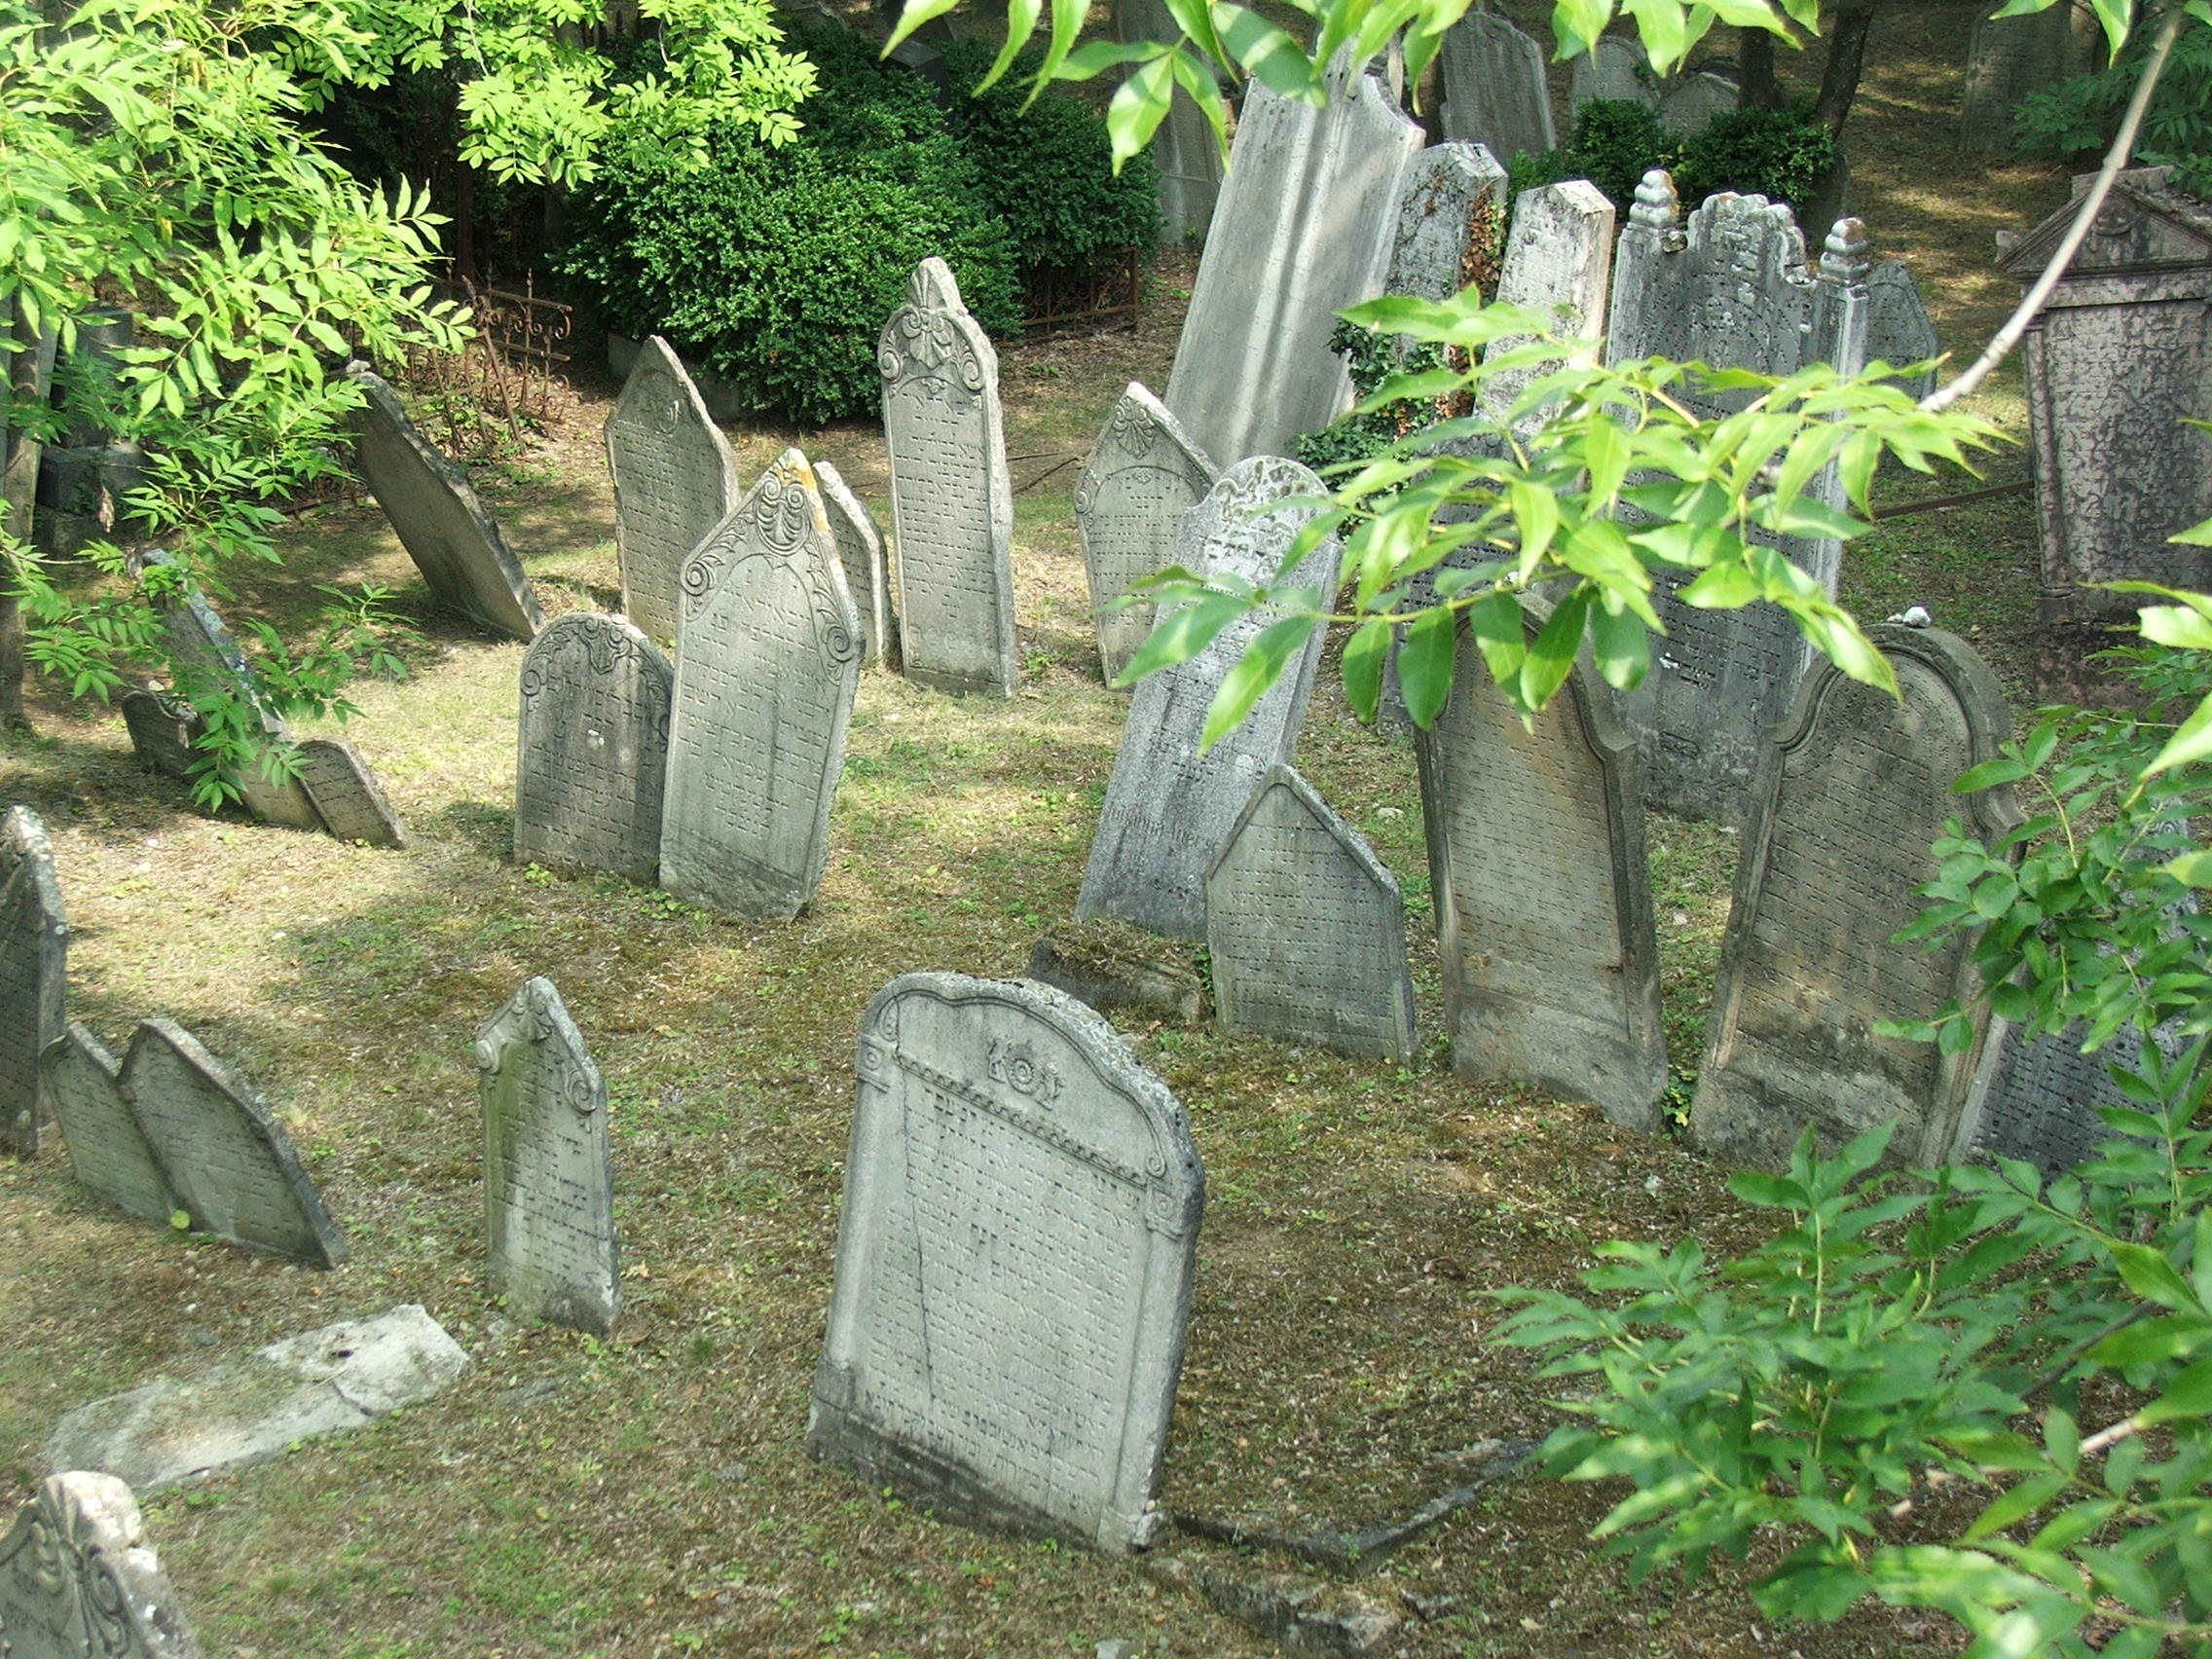 File:Mikulov jewish cemetery 2941.JPG - Wikimedia Commons